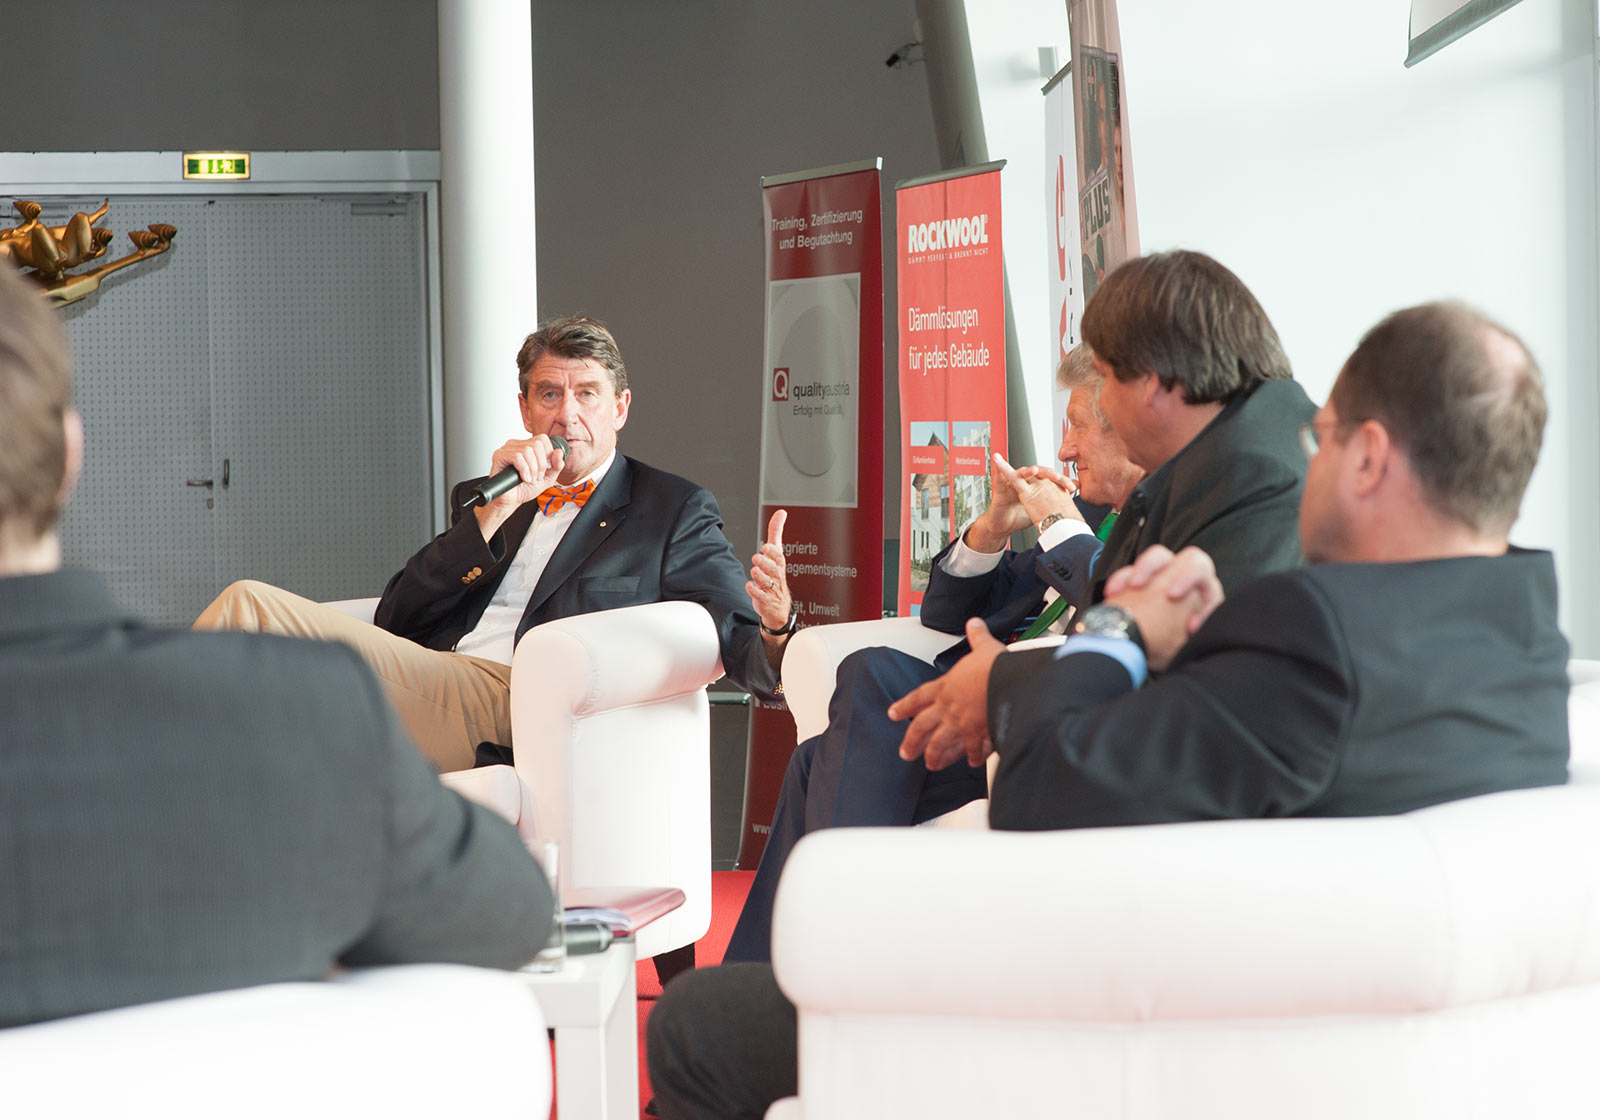 ATP CEO, Professor Christoph M. Achammer. Photo: Milena Krobath